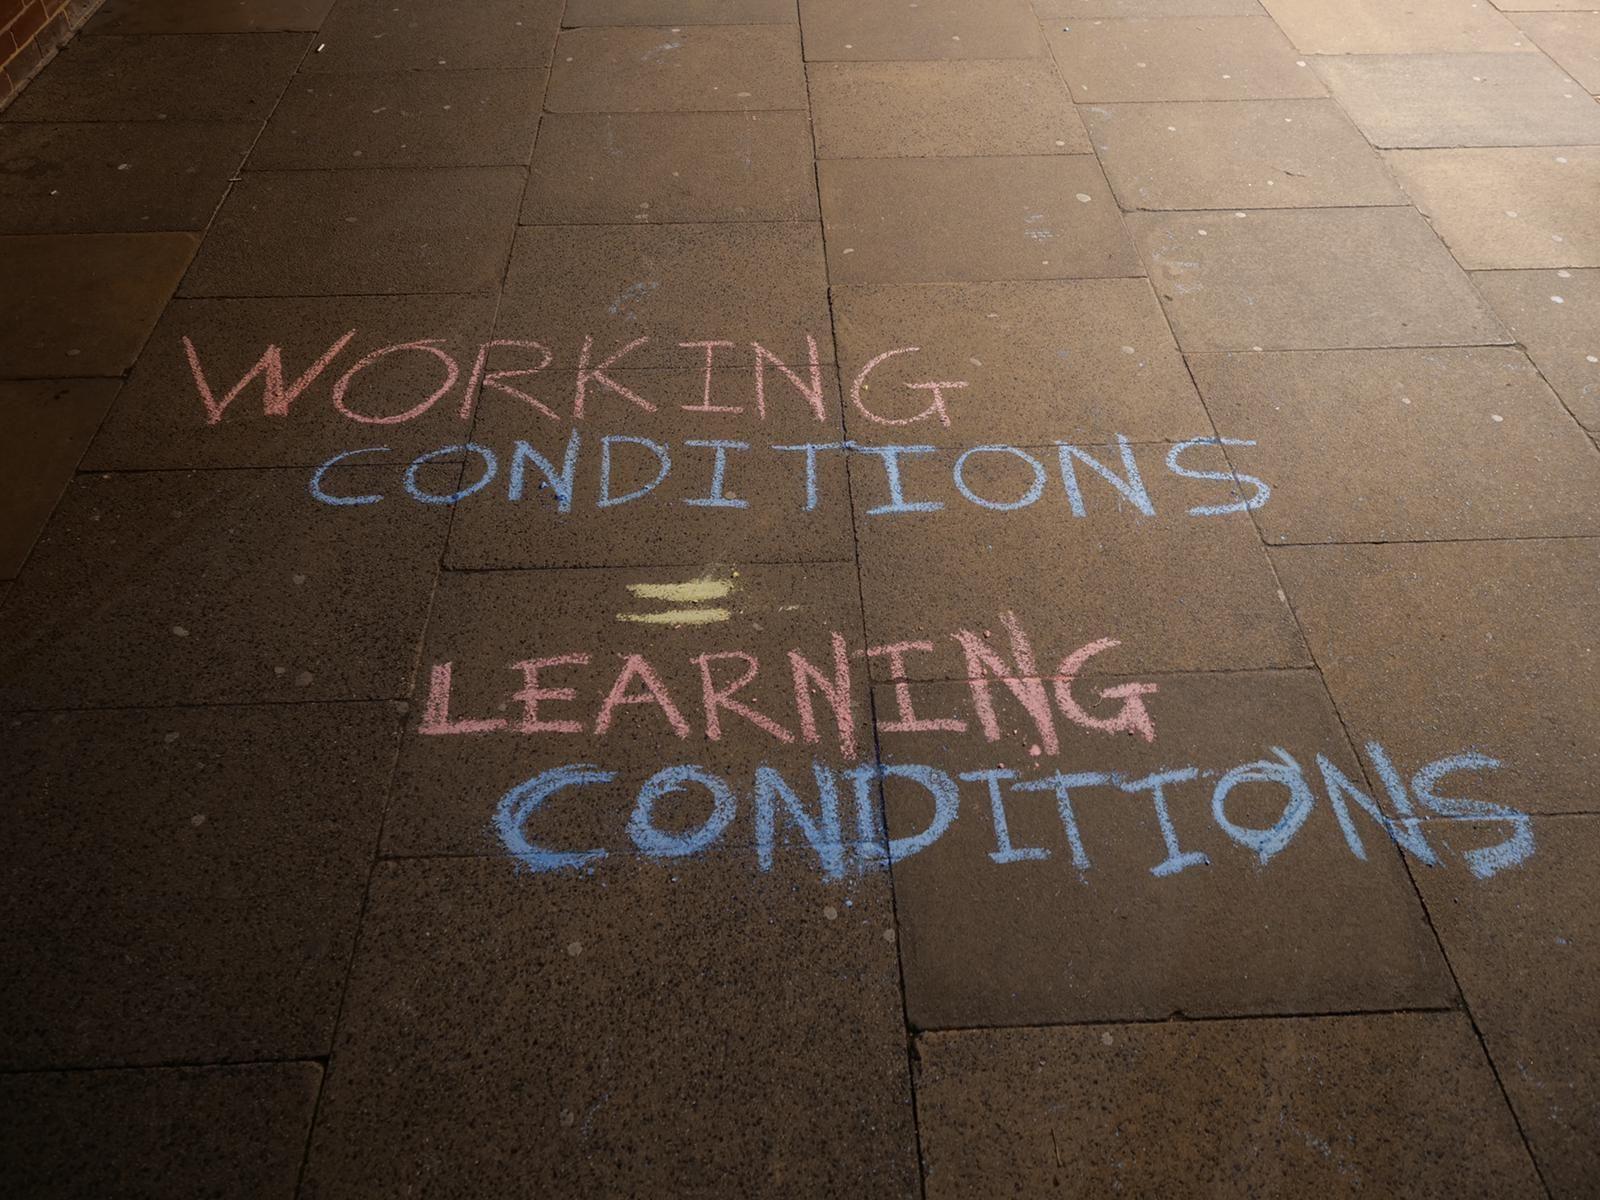 Image may contain: Handwriting, Flooring, Sidewalk, Pavement, Flagstone, Path, Floor, Text